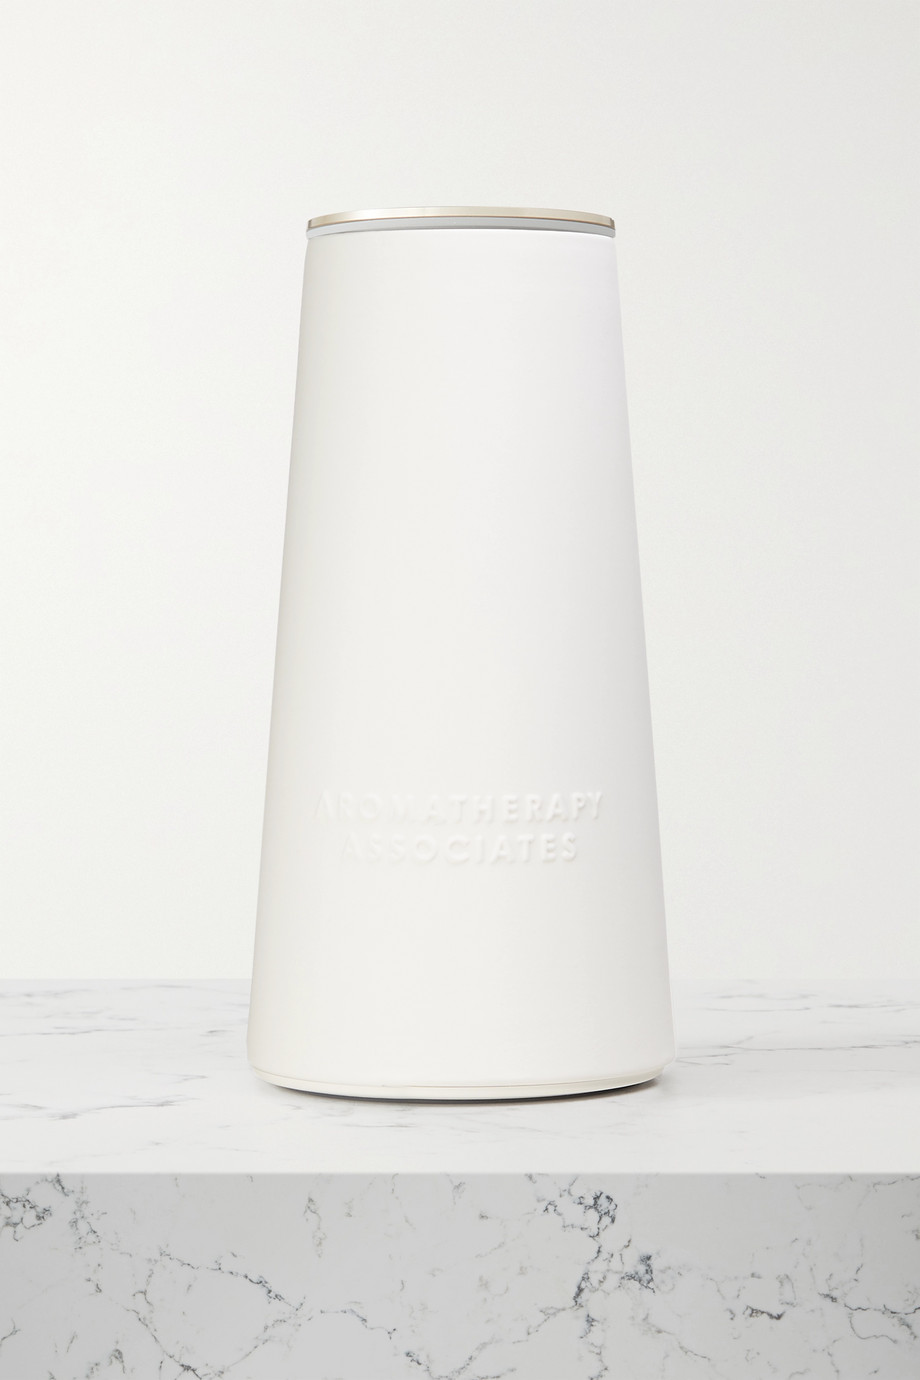 Aromatherapy Associates The Atomiser Ceramic Diffuser - UK 3-pin plug